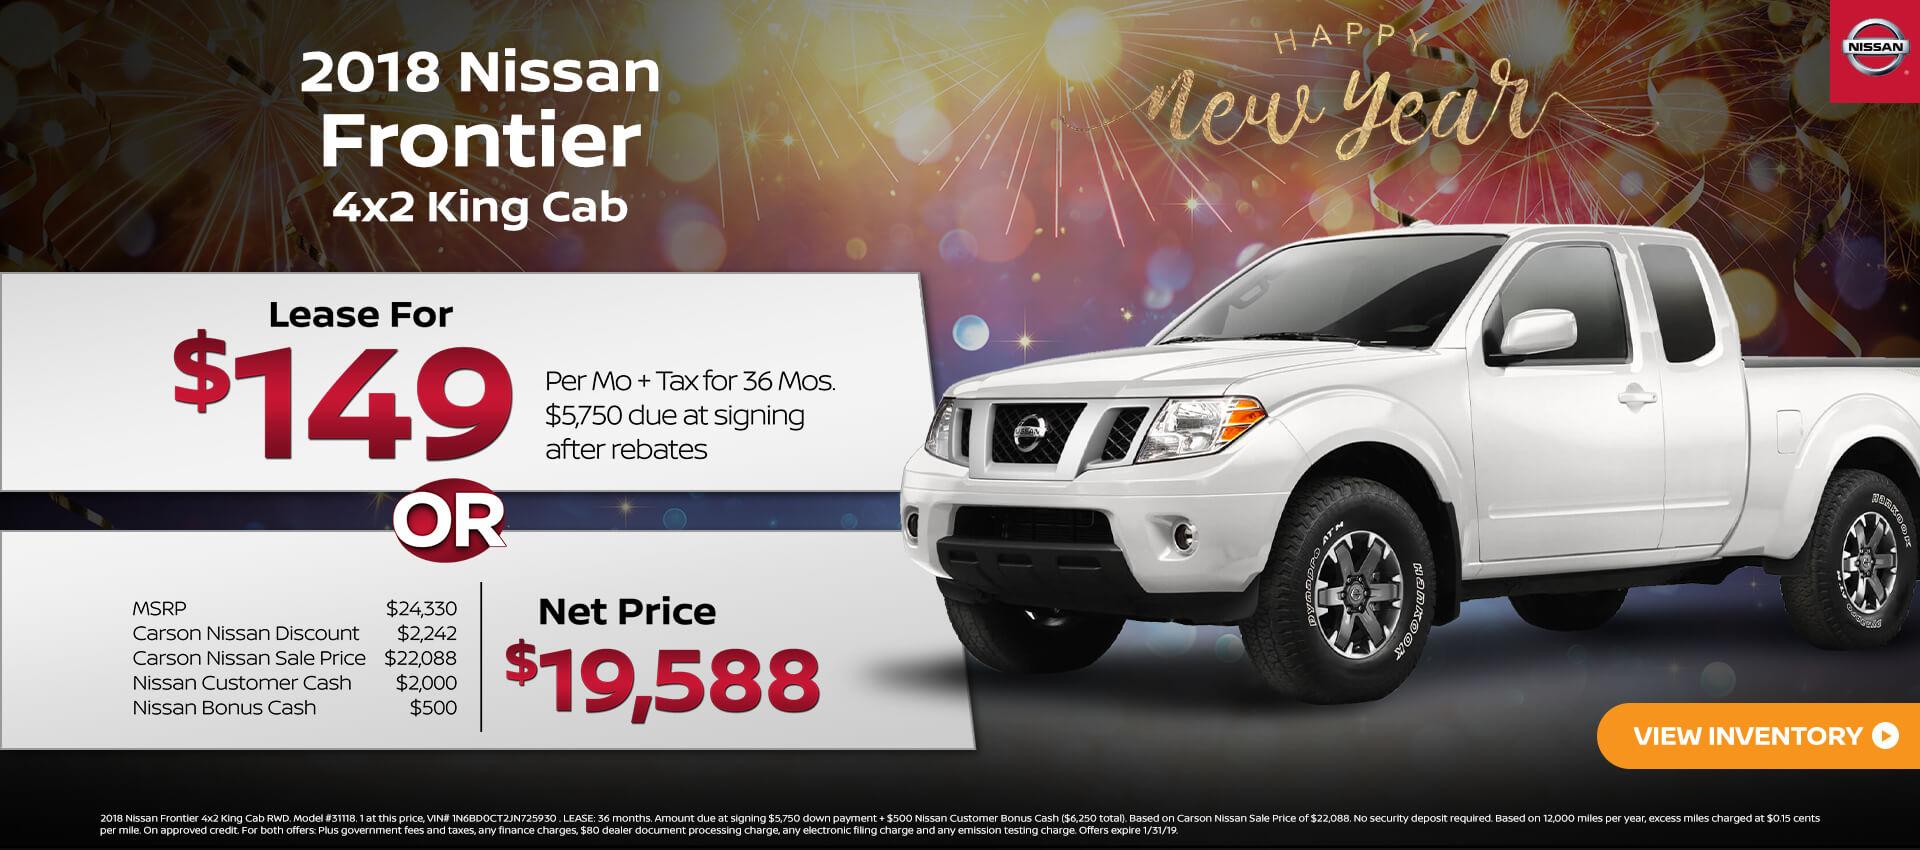 New Used Nissan Dealer Los Angeles Long Beach Torrance